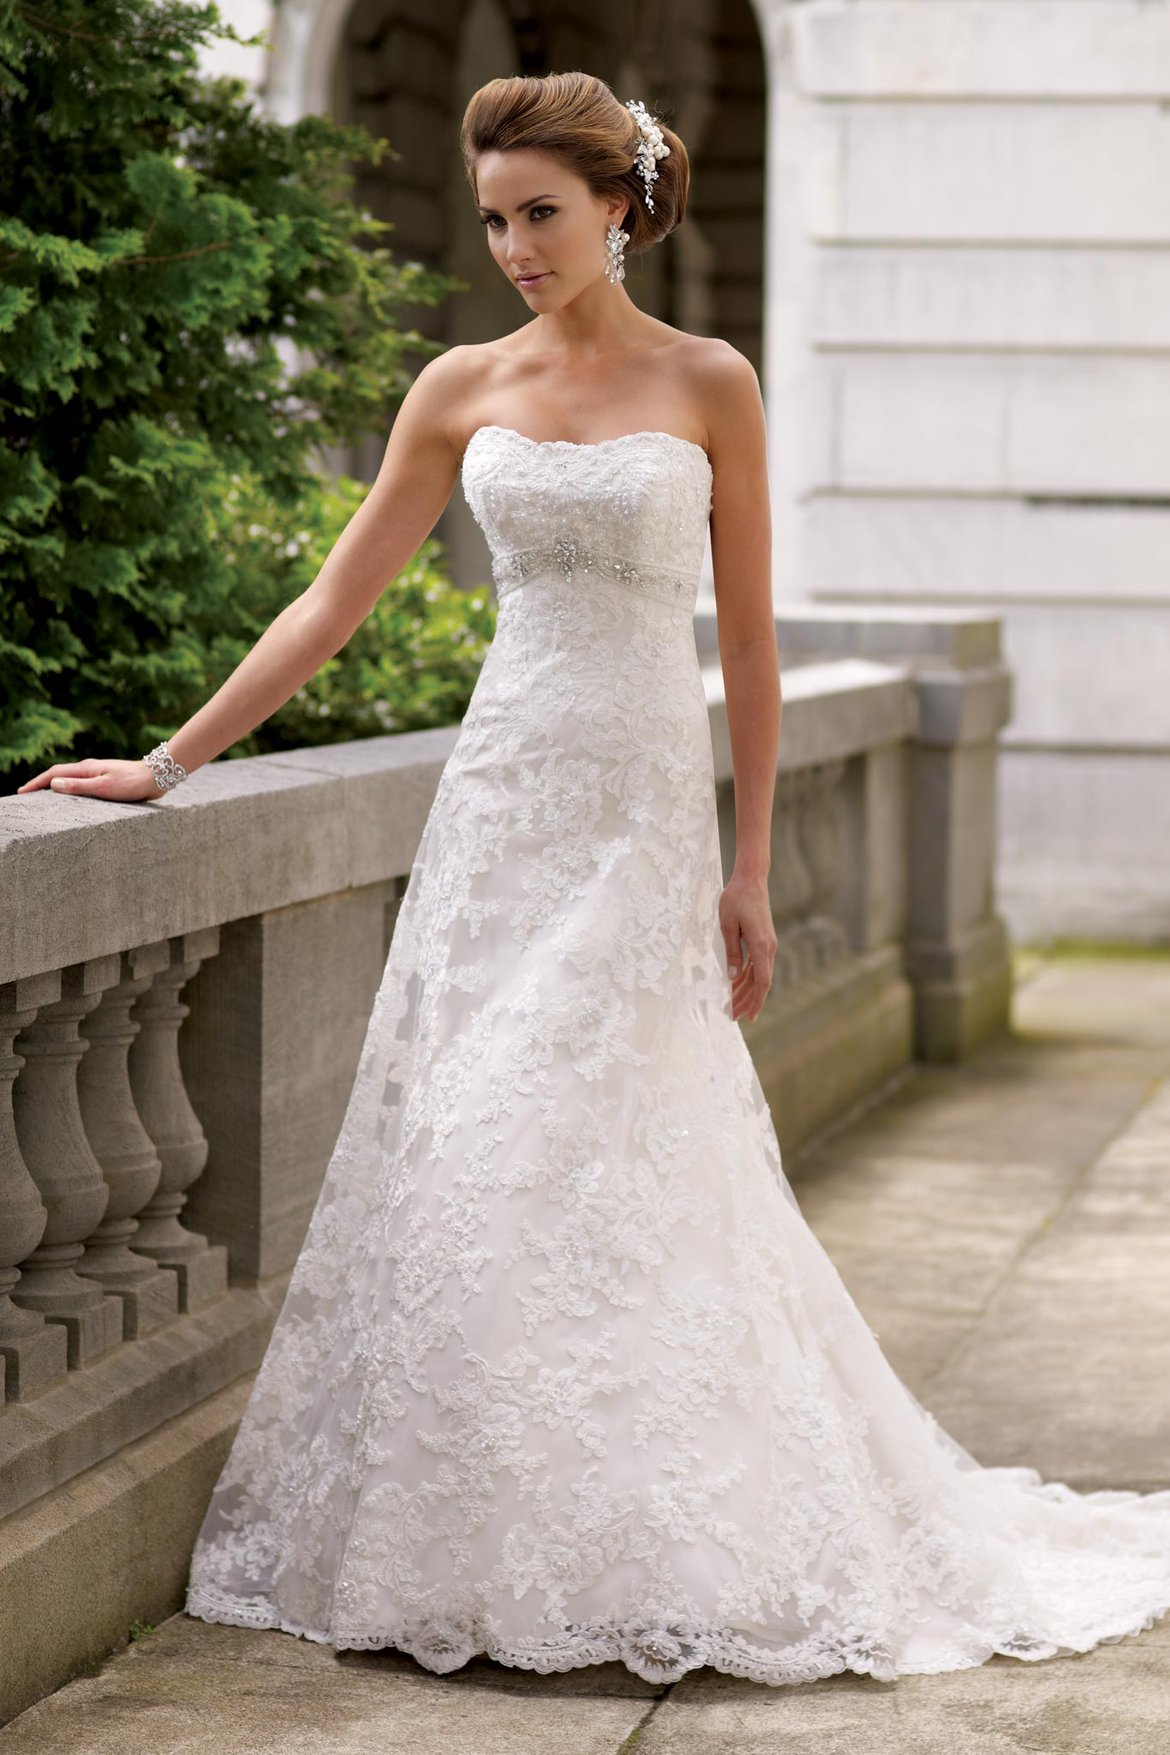 Images of Wedding Dress Sites - Wedding ring ideas-oakvs.com